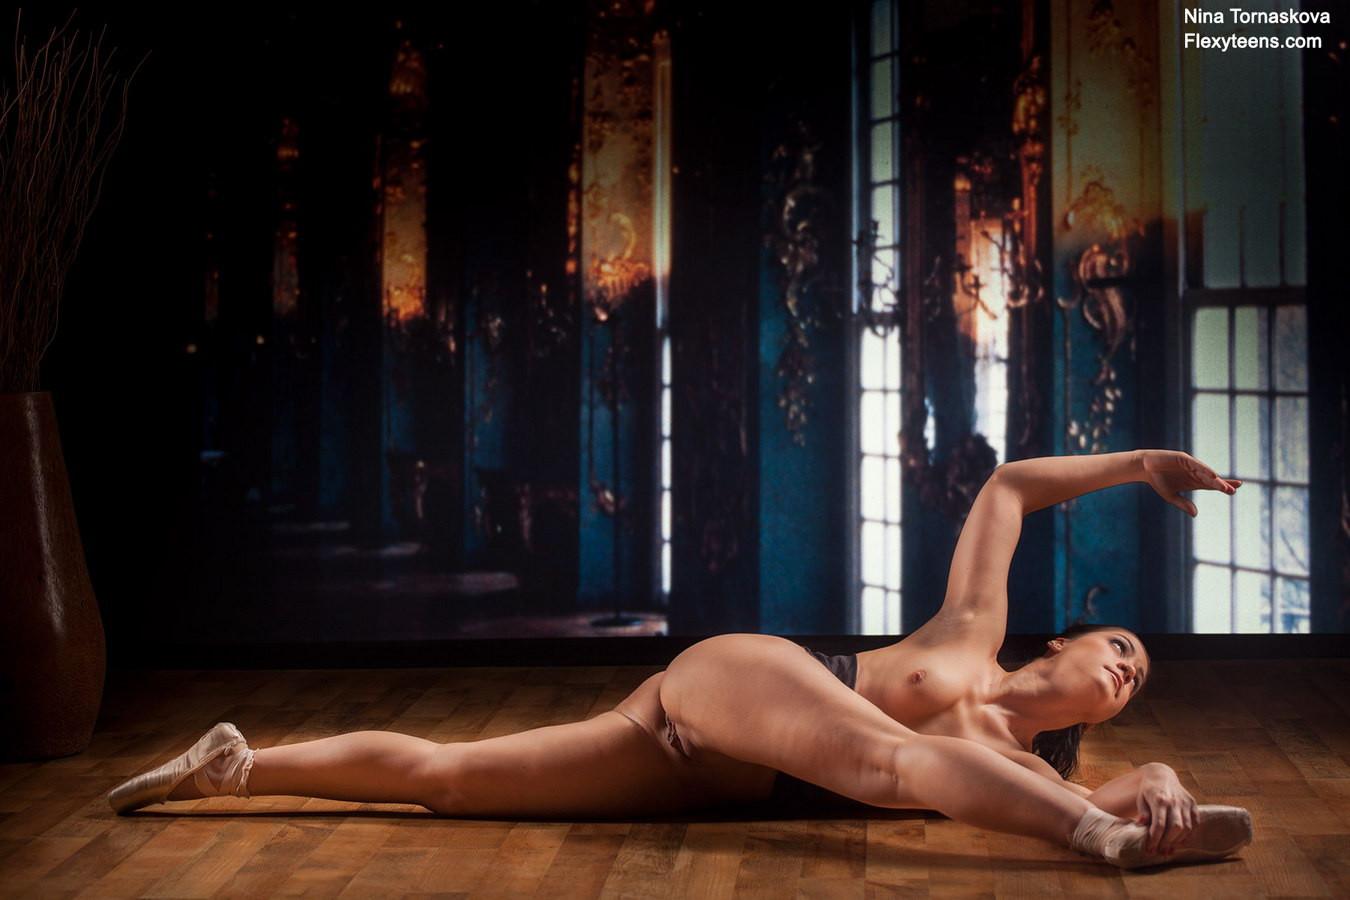 ragazzina figa nuda, adolescente figa nuda, ginnasta nuda, atlete nude